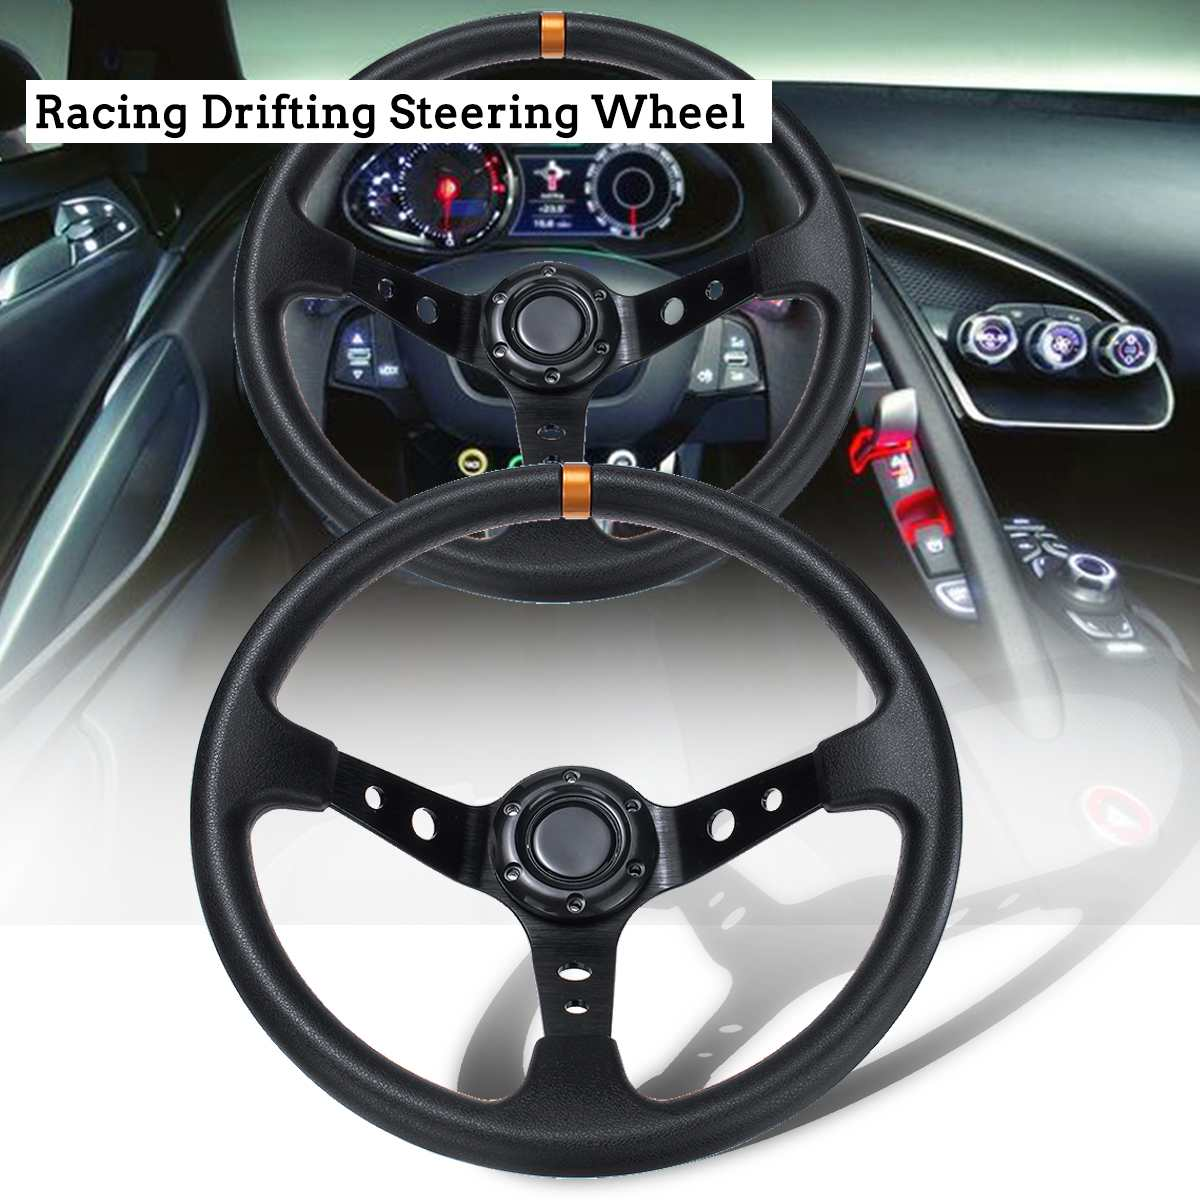 Volante de carreras de coches Drift Auto Sports volante 14 pulgadas 350mm PU y aluminio Universal Deep Corn Dish modificado partes